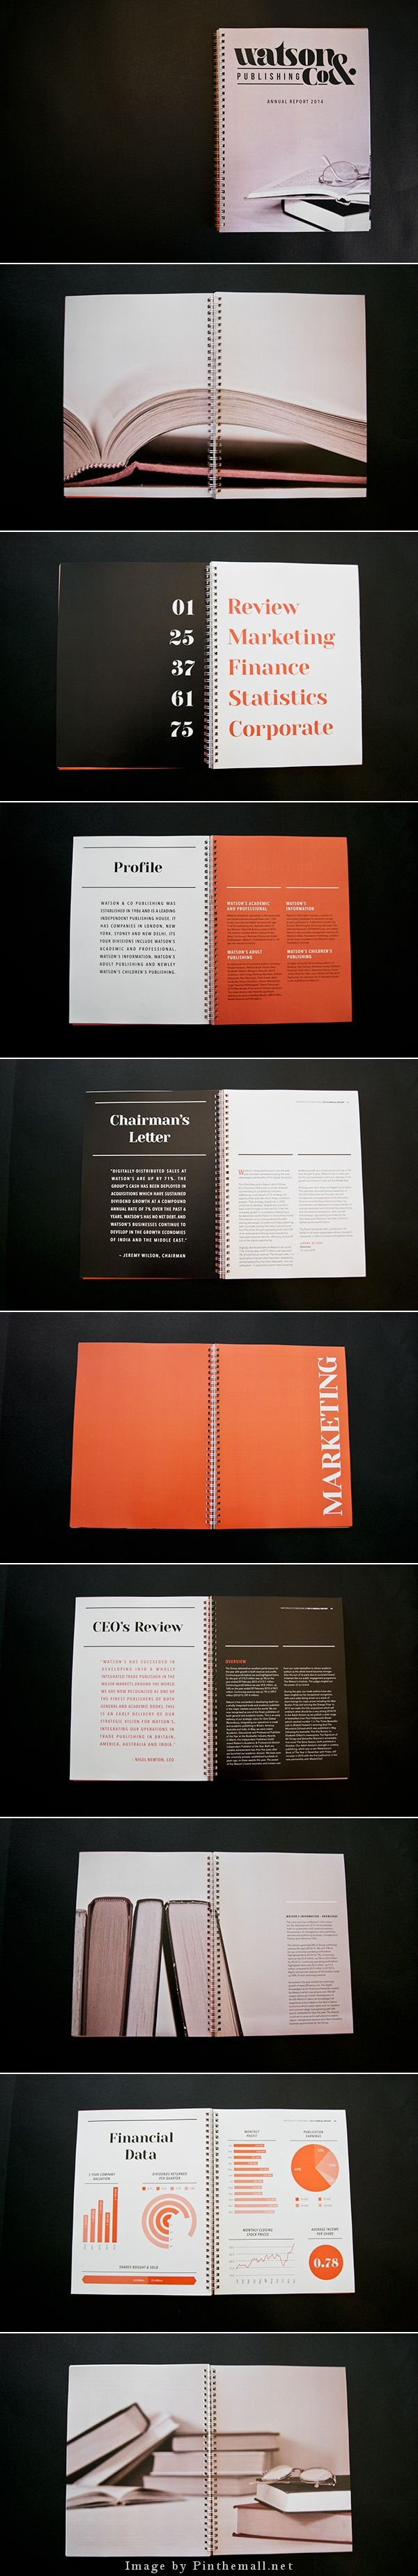 Watson Co Annual Report by Melissa Hawkett.